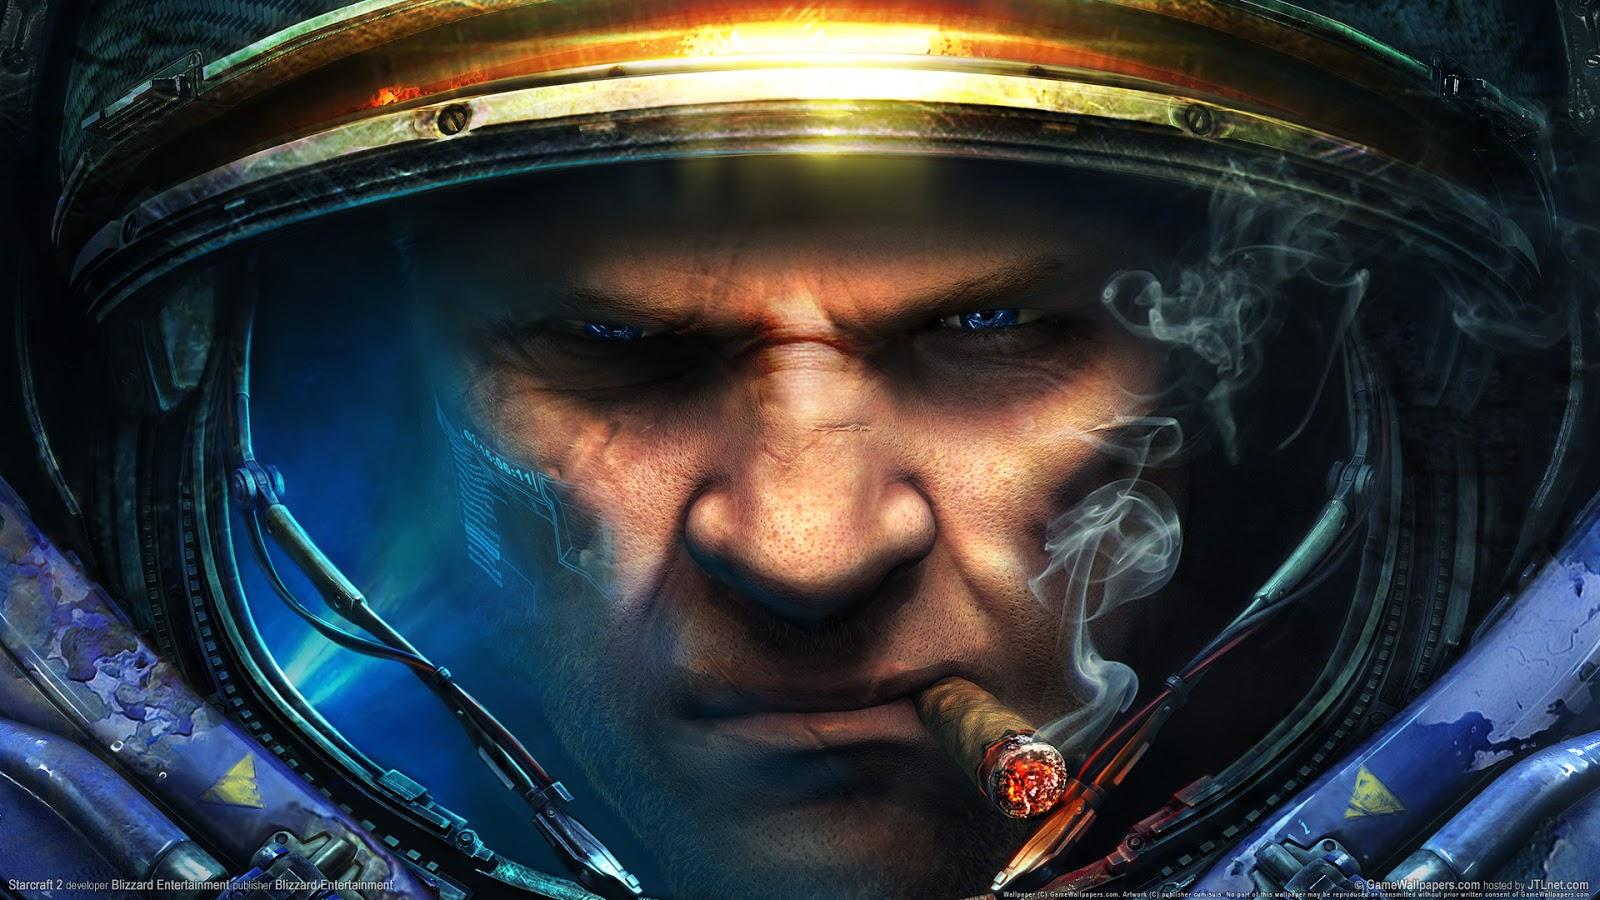 http://4.bp.blogspot.com/-jRcqnTY5ApQ/UHfIf3XTvZI/AAAAAAAAACA/K0vFOgspUBE/s1600/gaming-wallpaper-full-hd-starcraft-epic-face-blue-eye.jpg